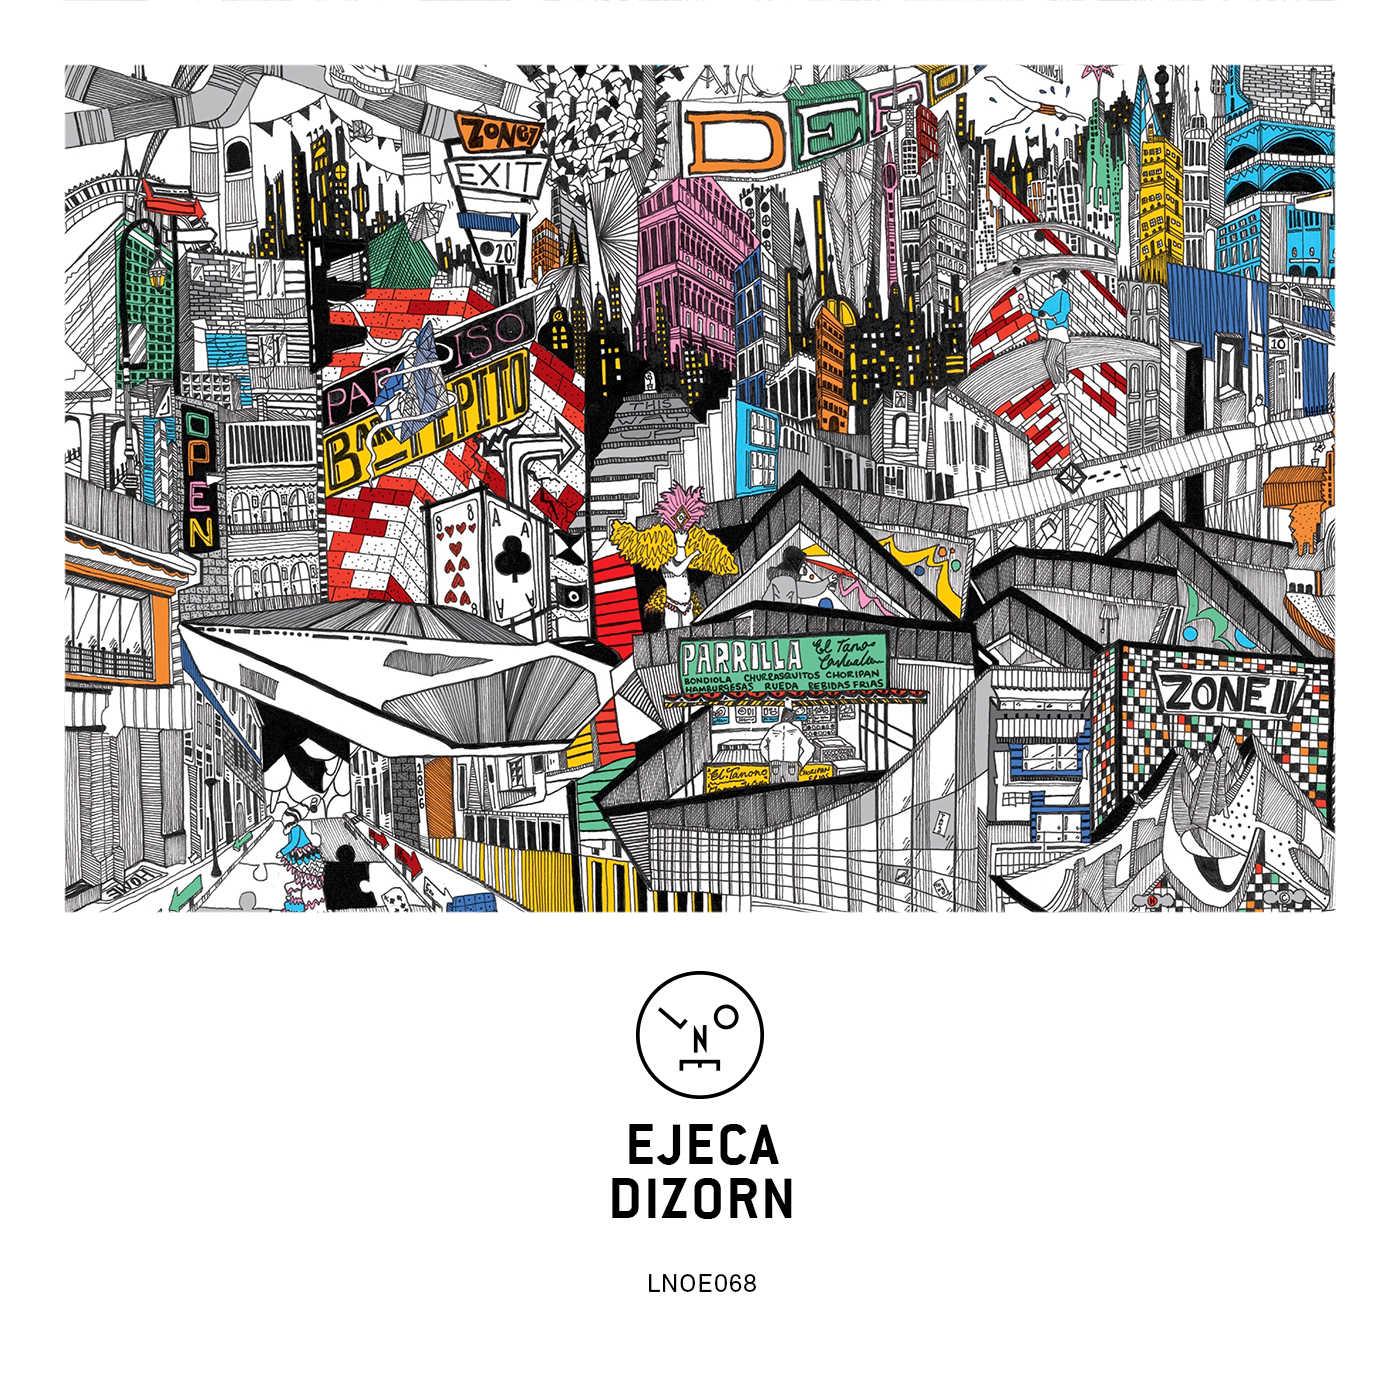 Ejeca – Dizorn (Last Night On Earth)